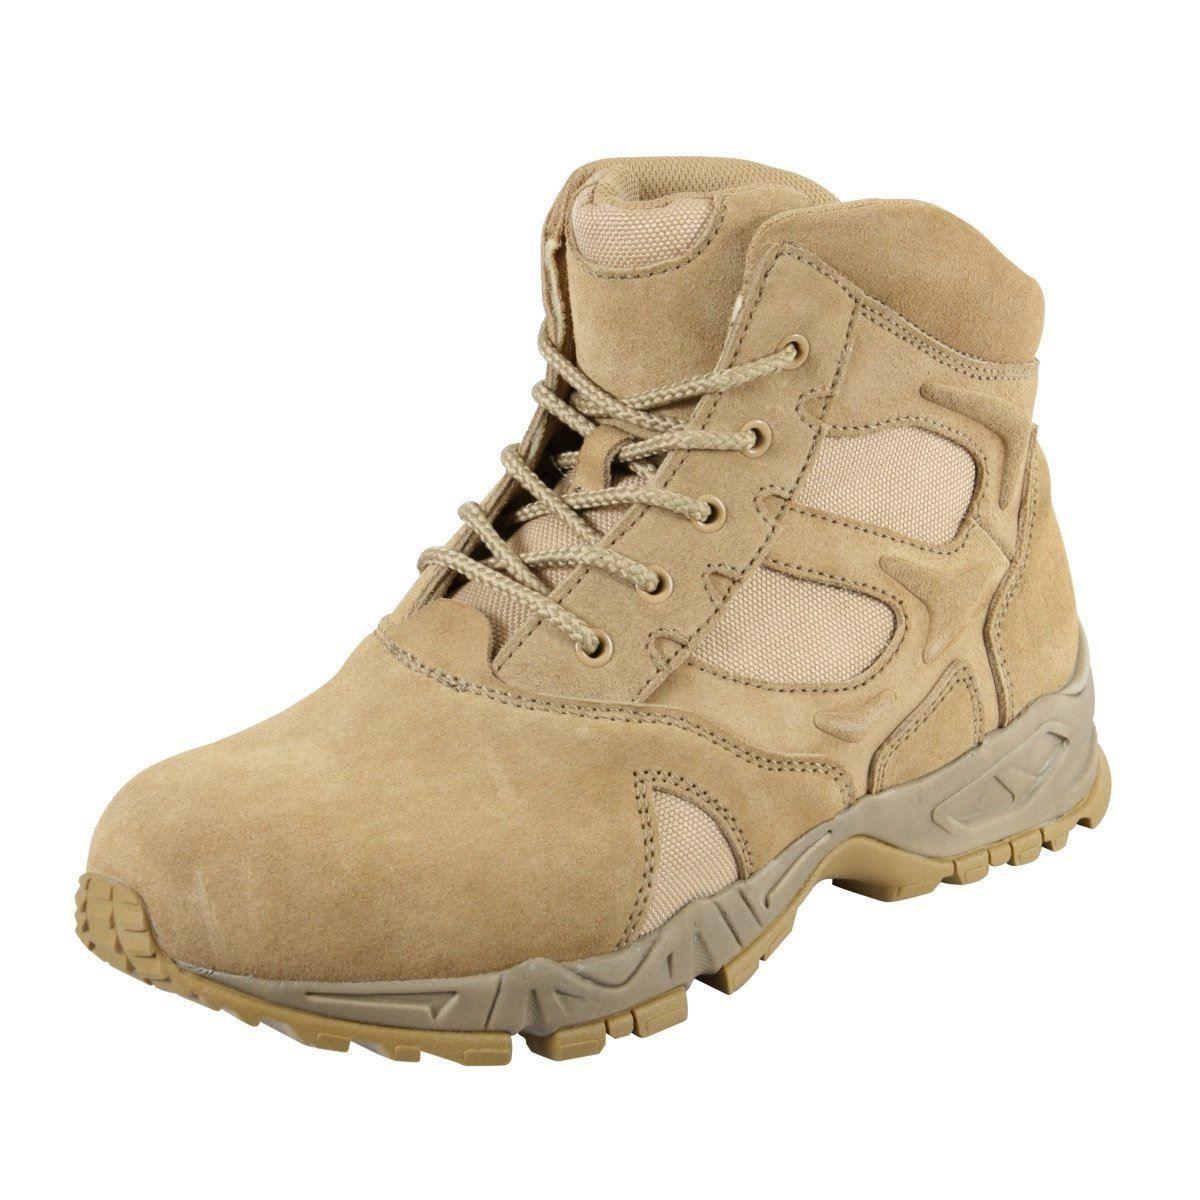 Best Military Running Boots - 1st Response Tech  749f198b4c66